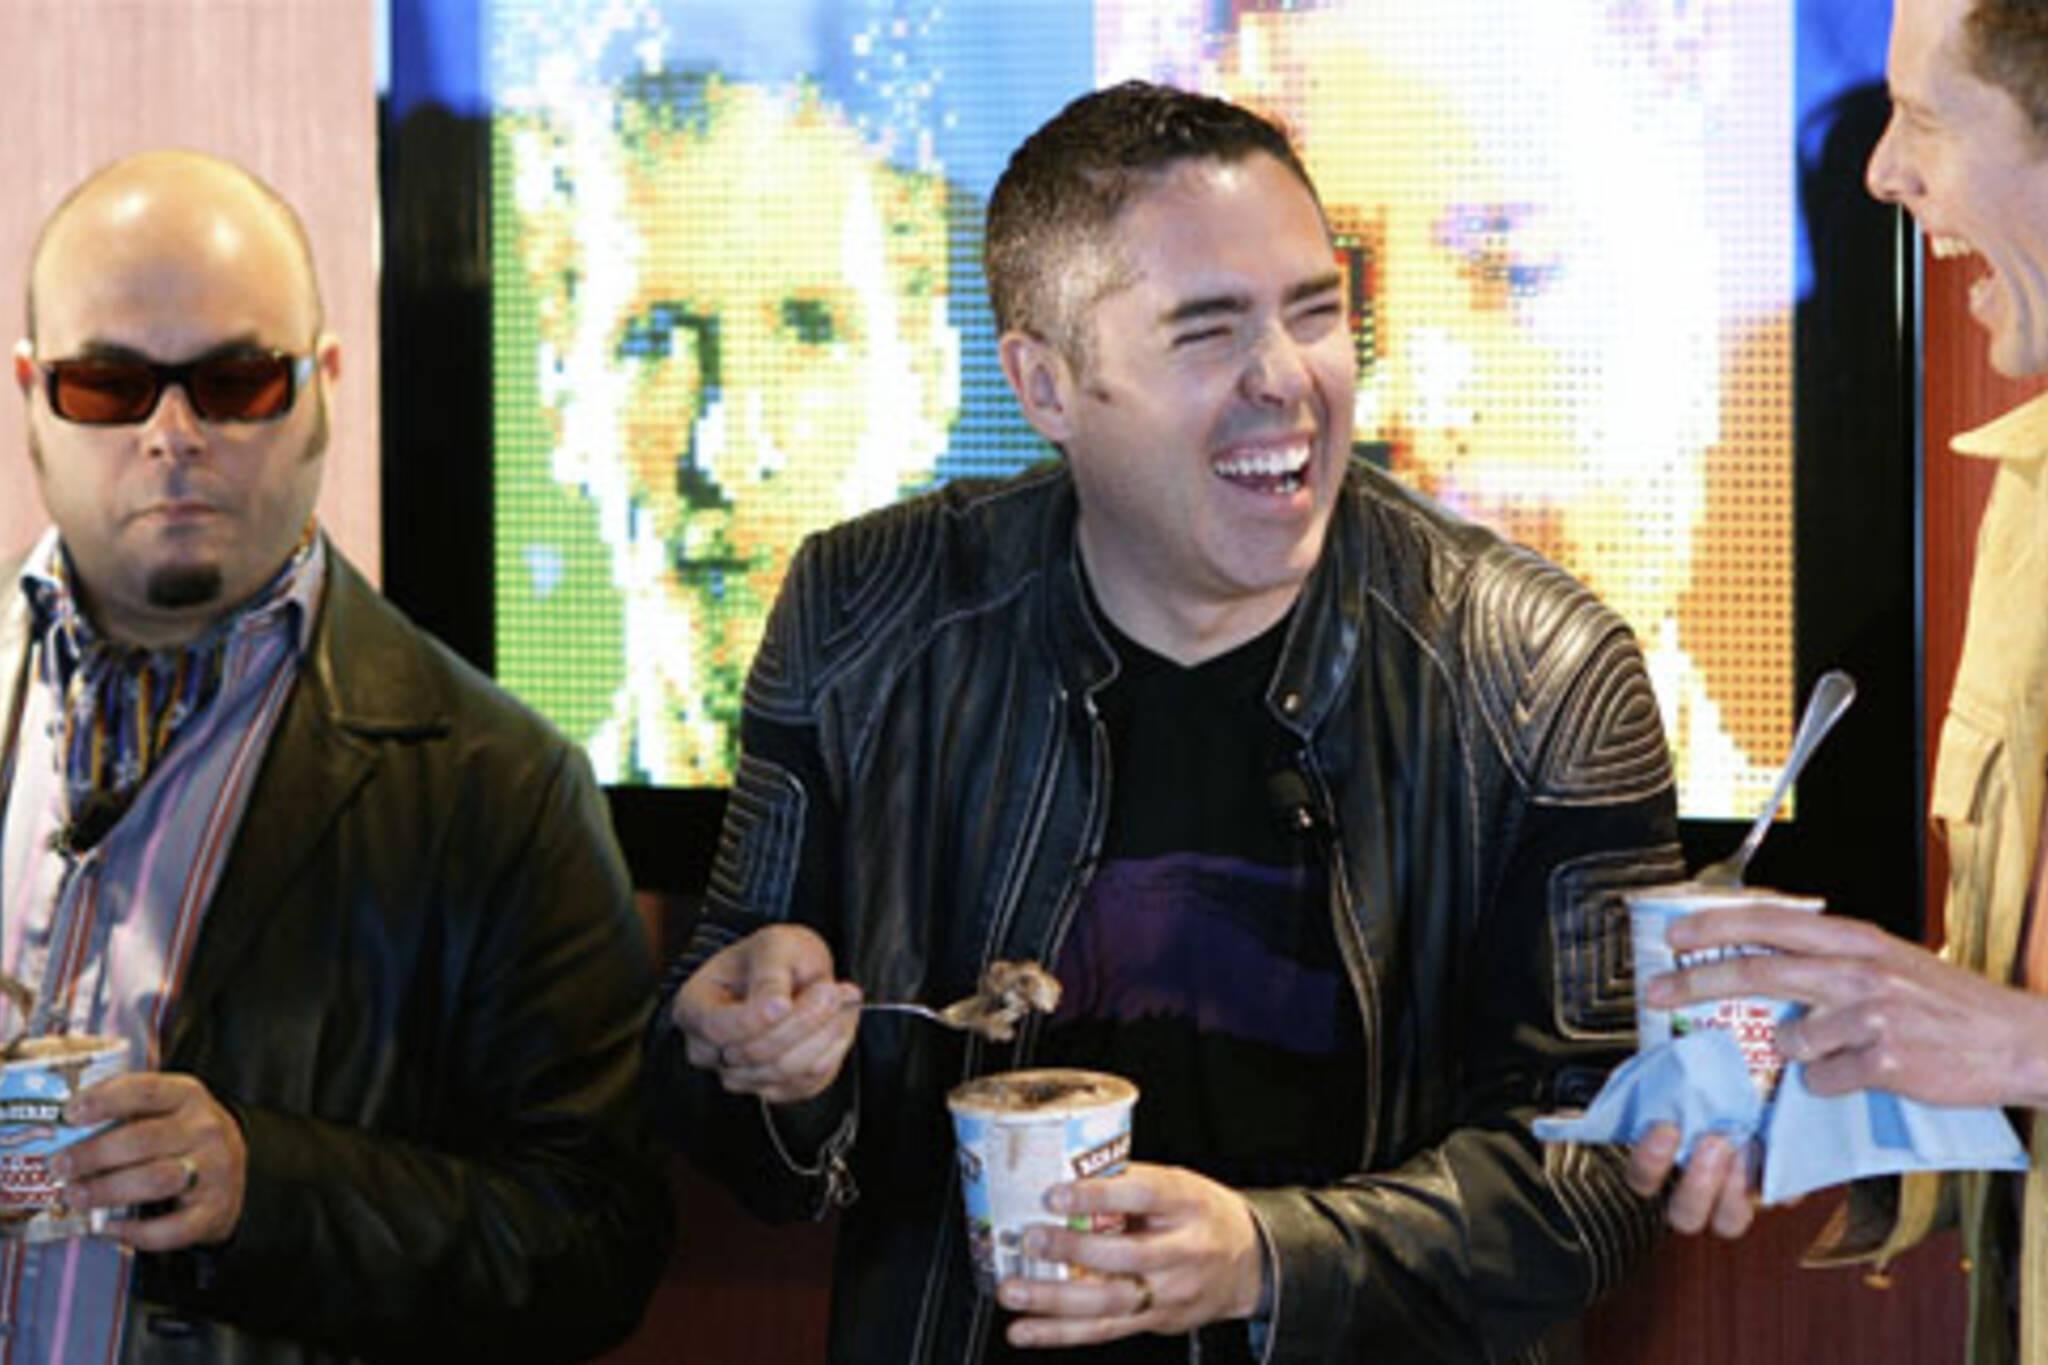 Barenaked Ladies unveil new Ben & Jerry's ice cream flavour